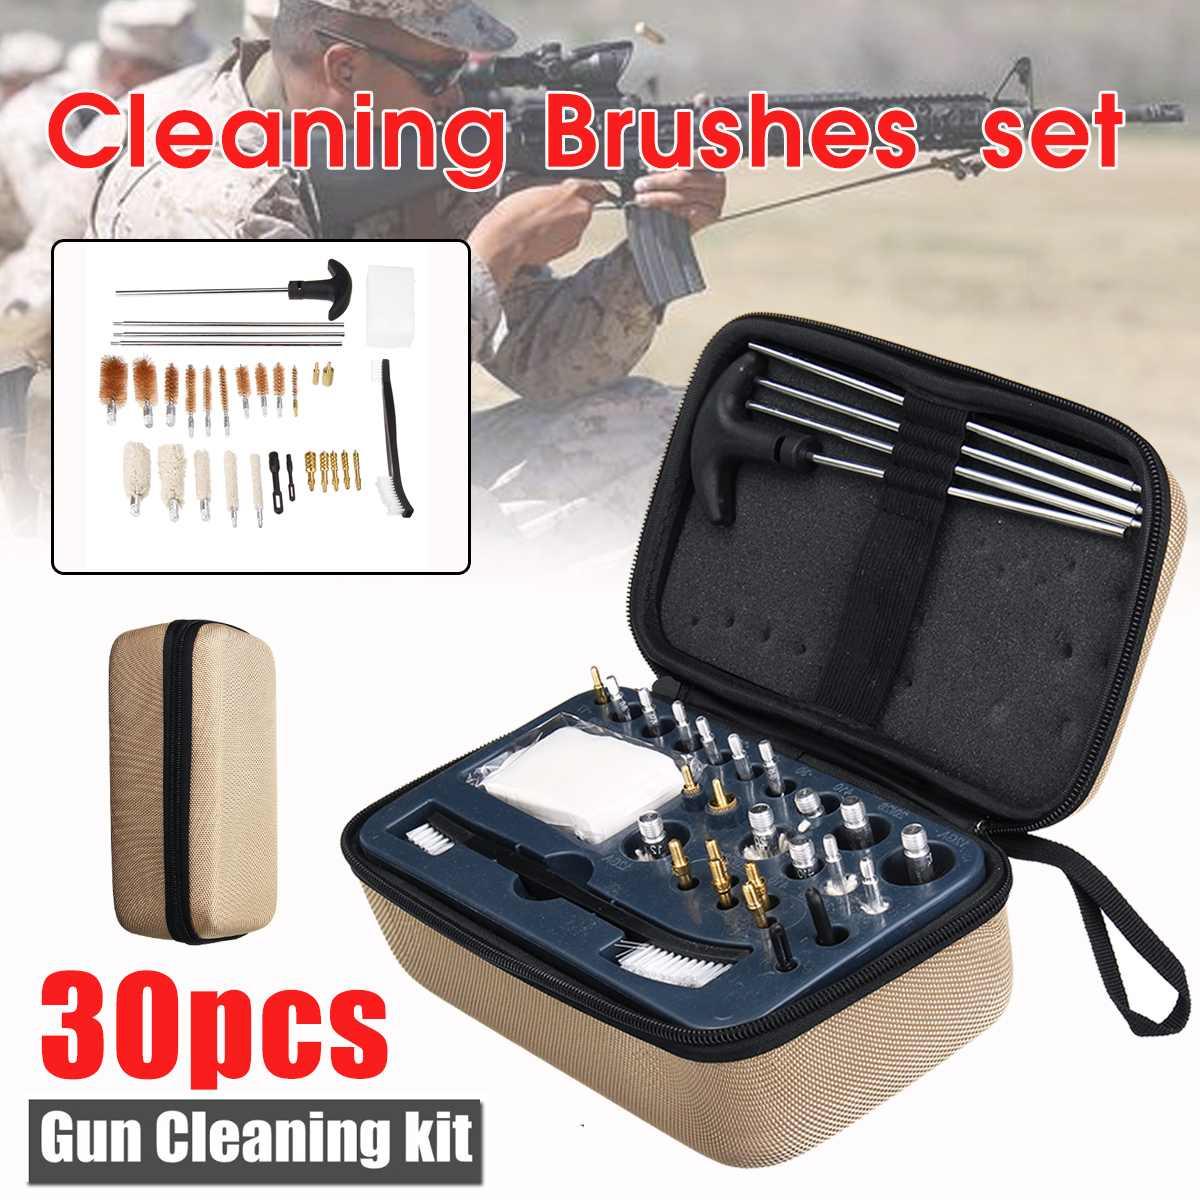 30 En 1 Kit Universal de limpieza de armas para Rifle pistola cepillo para escopeta herramienta Estuche de transporte accesorio de caza